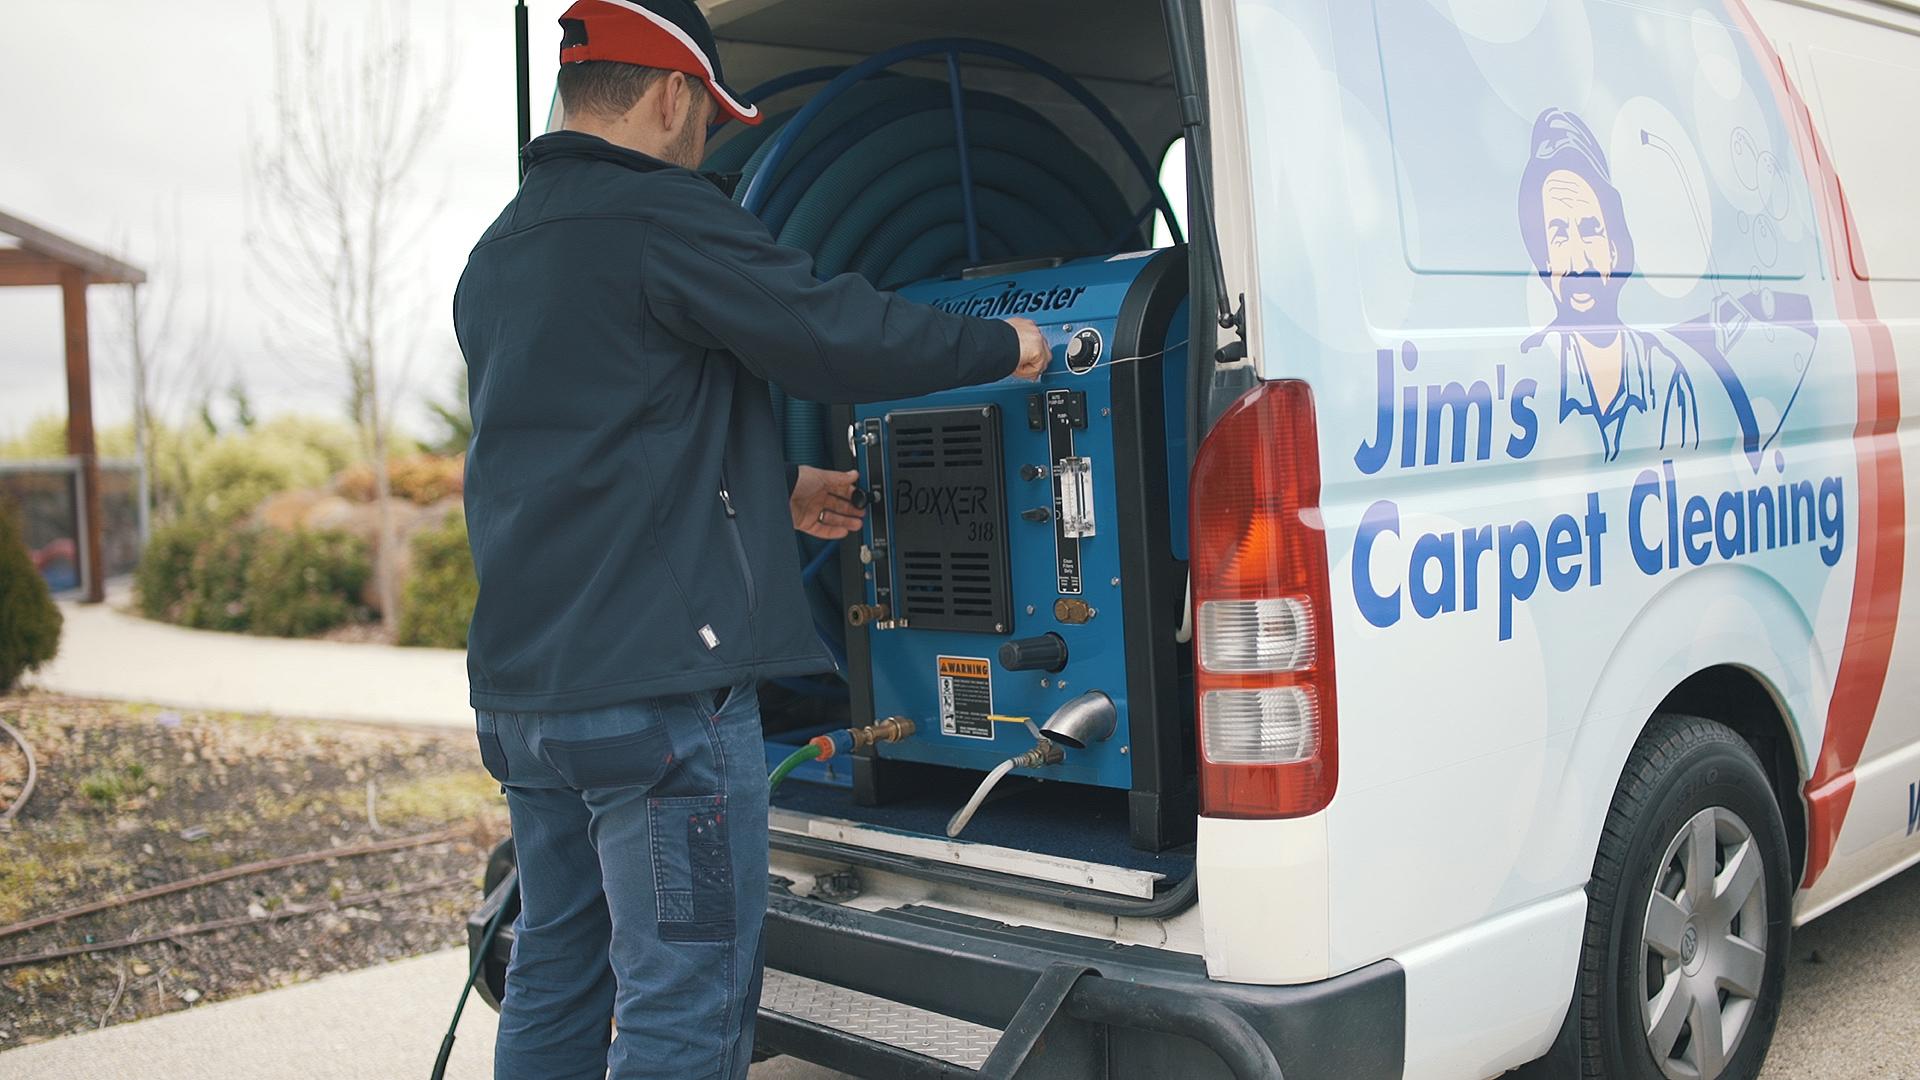 Jim's Carpet Cleaning Mount Waverley